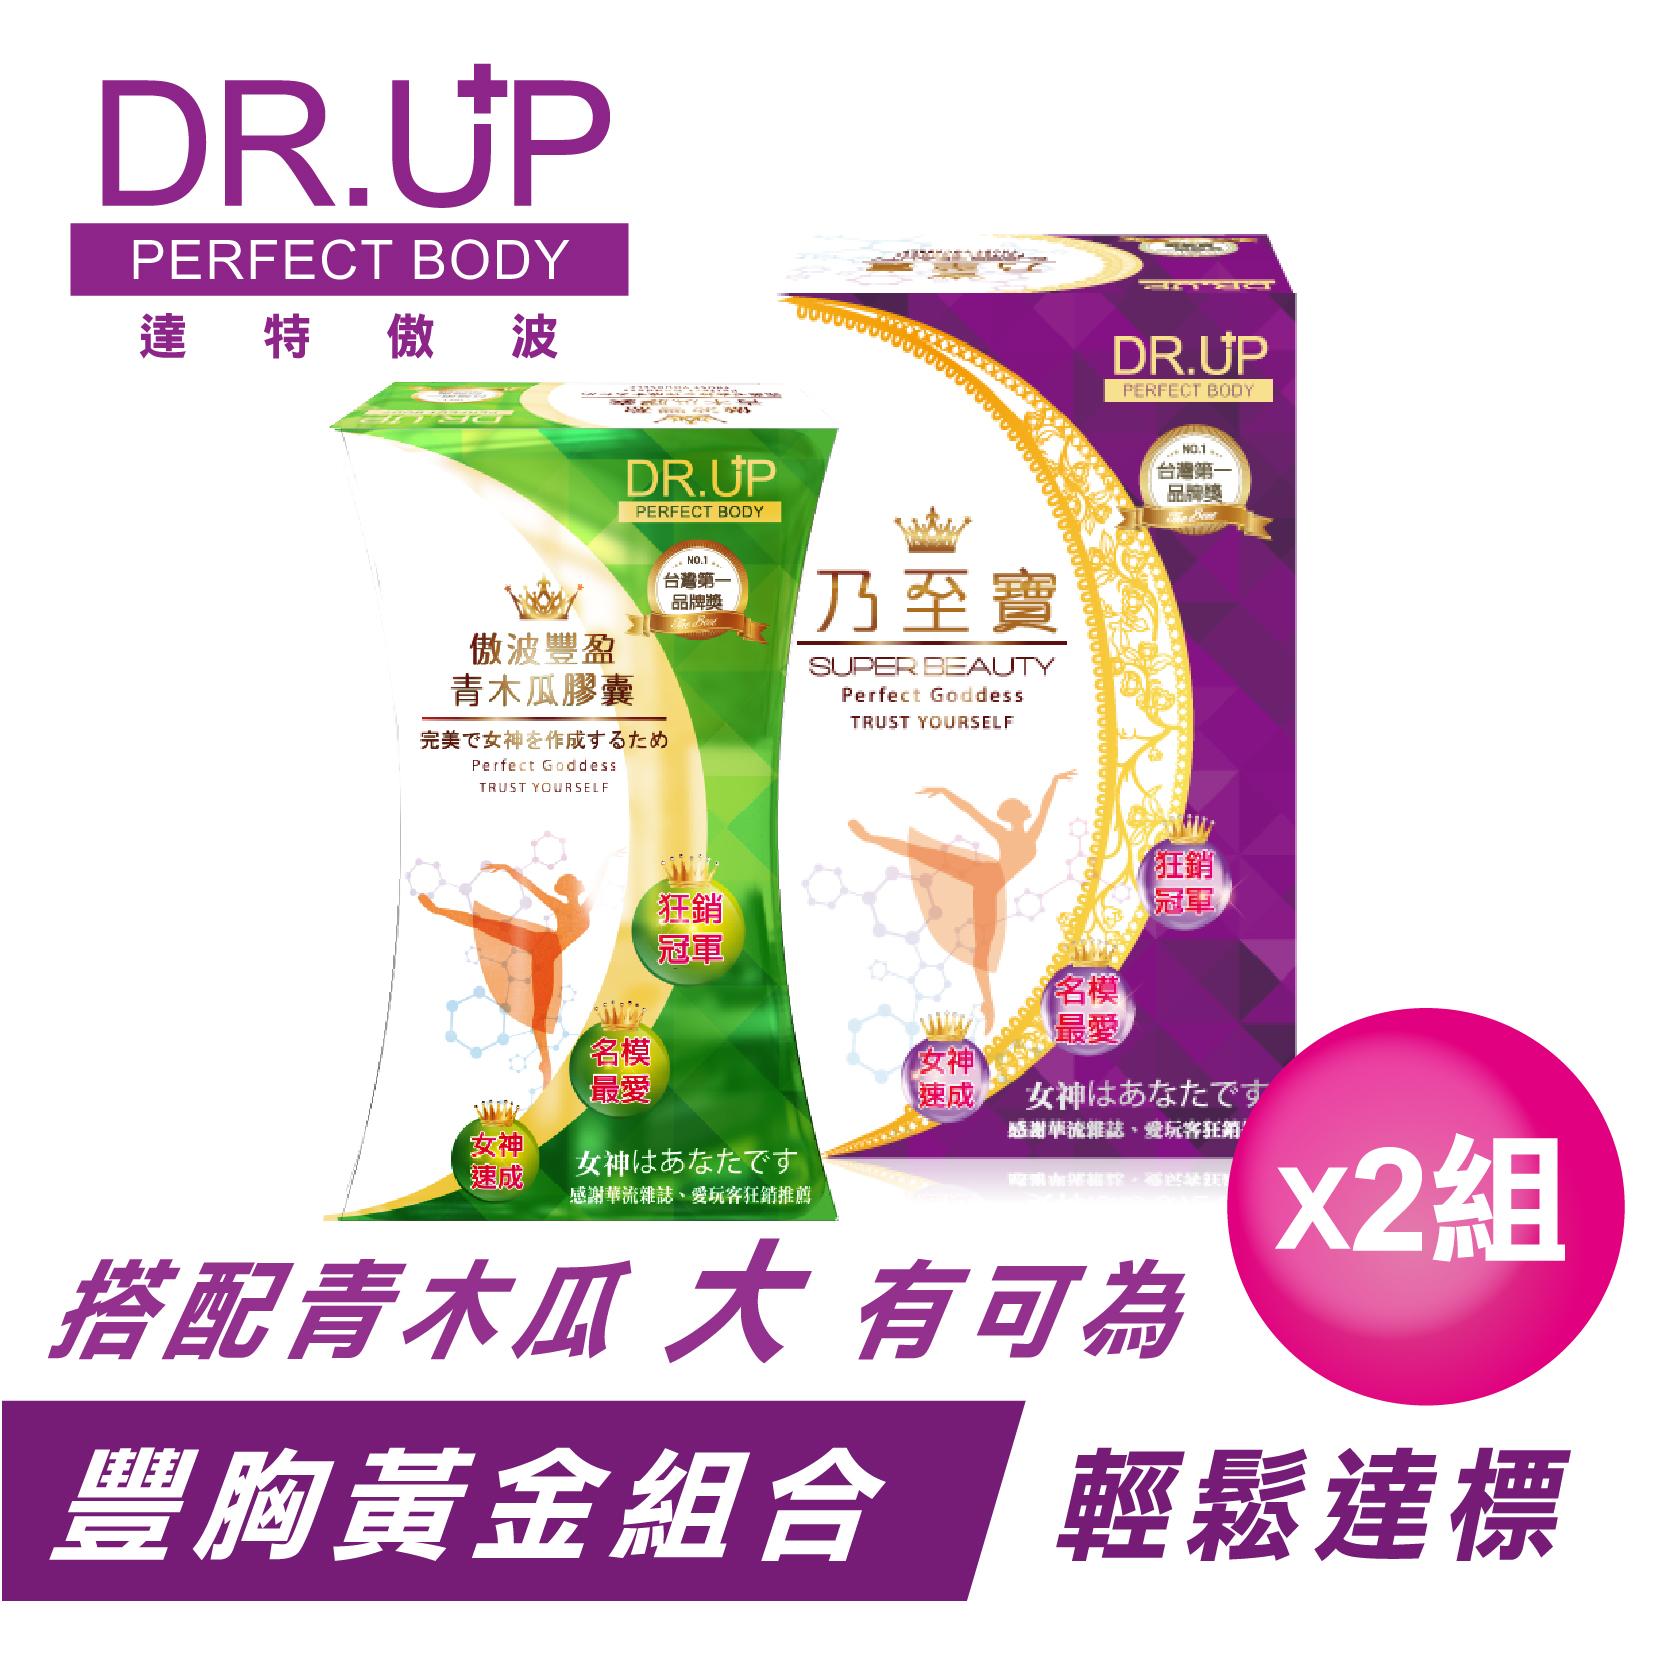 【DR.UP】乃至寶特濃第二代+特濃青木瓜豐盈膠囊(2組)